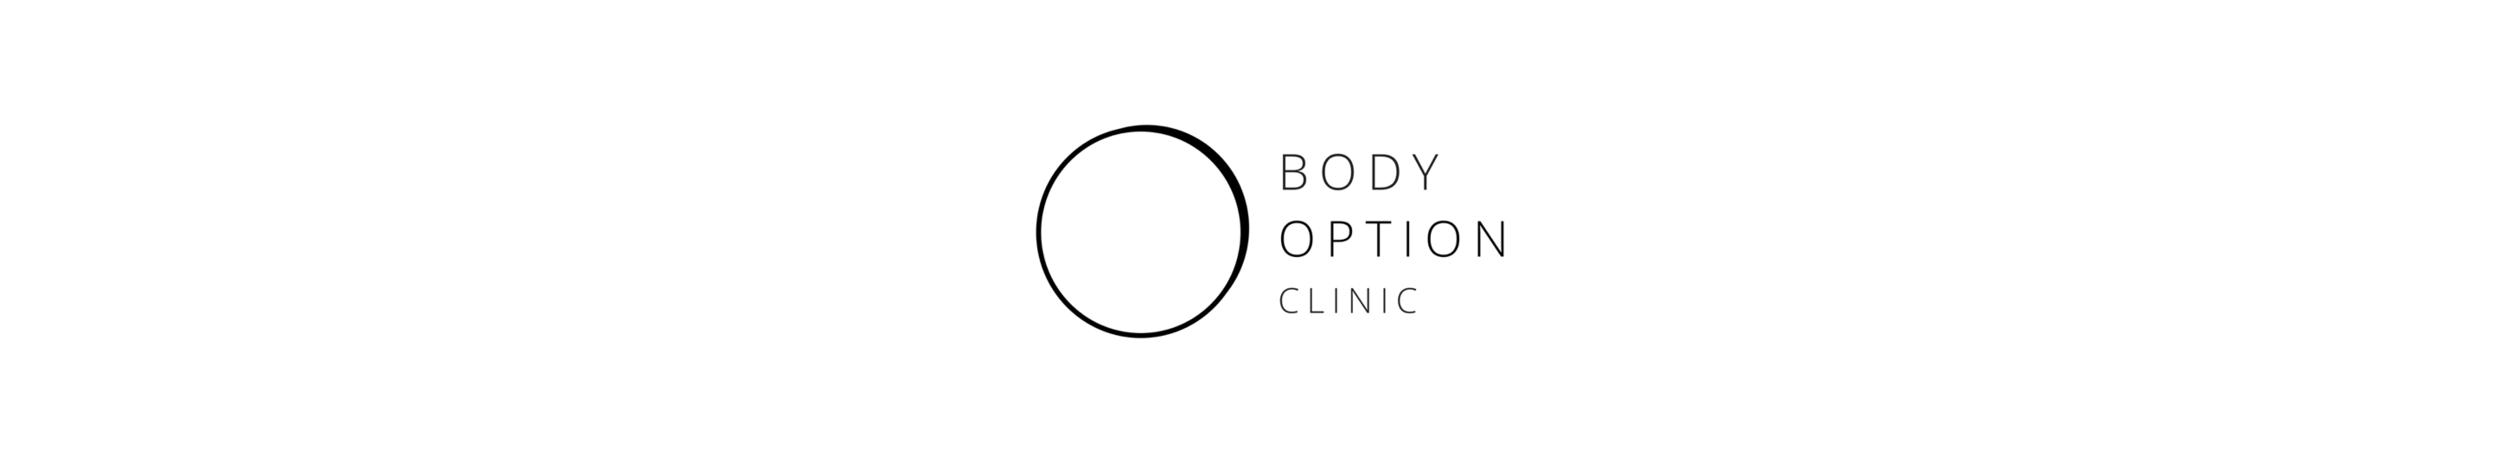 clinic-logo-design.png